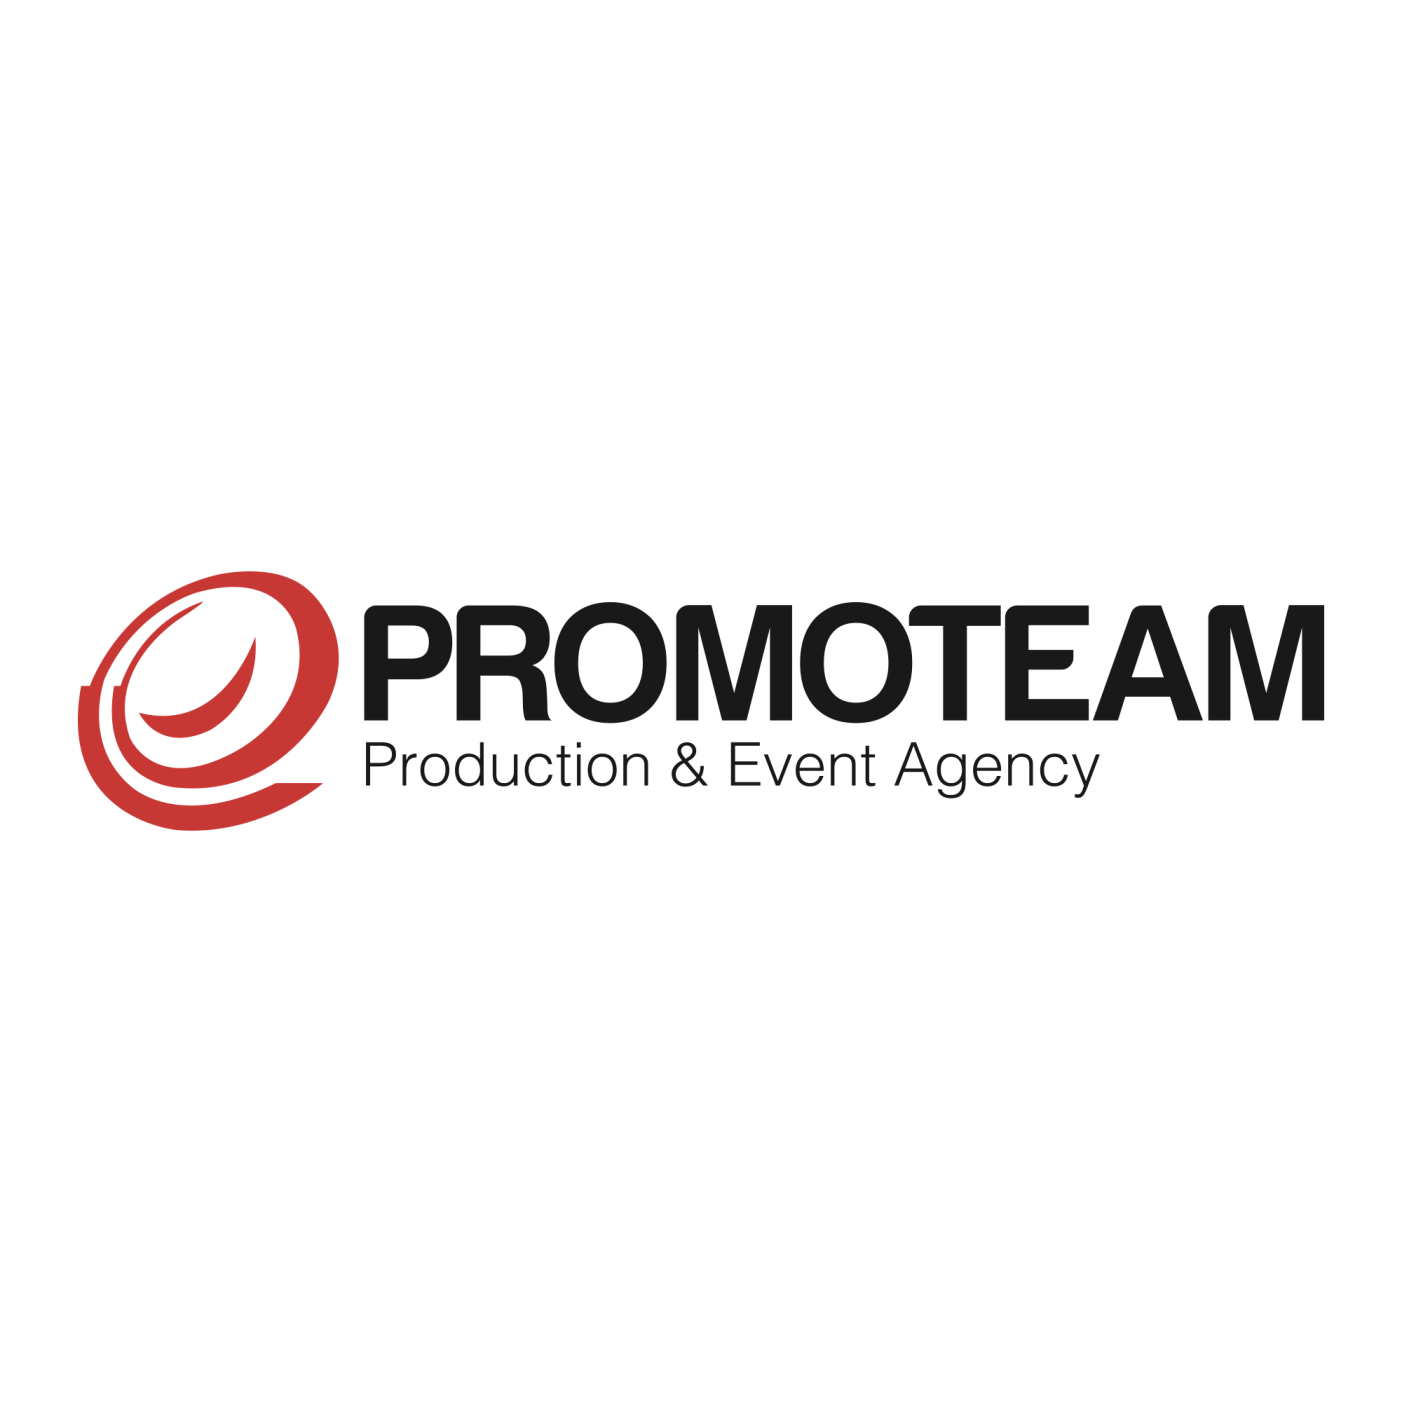 promoteam